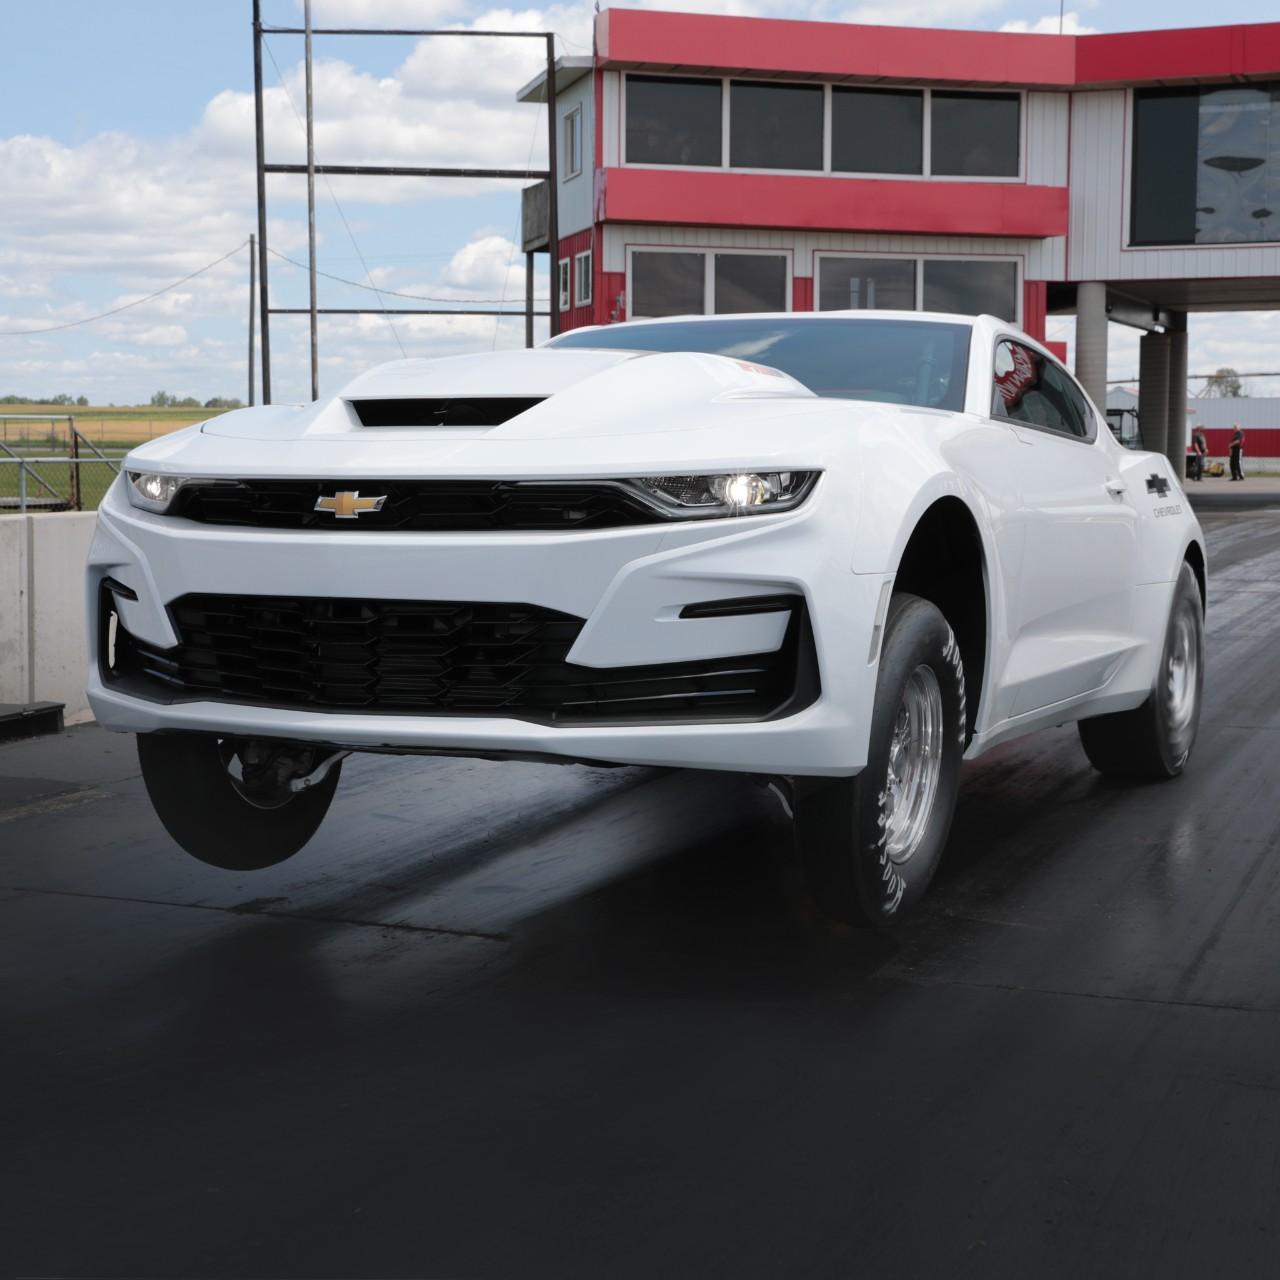 Chevrolet COPO Camaro 2022